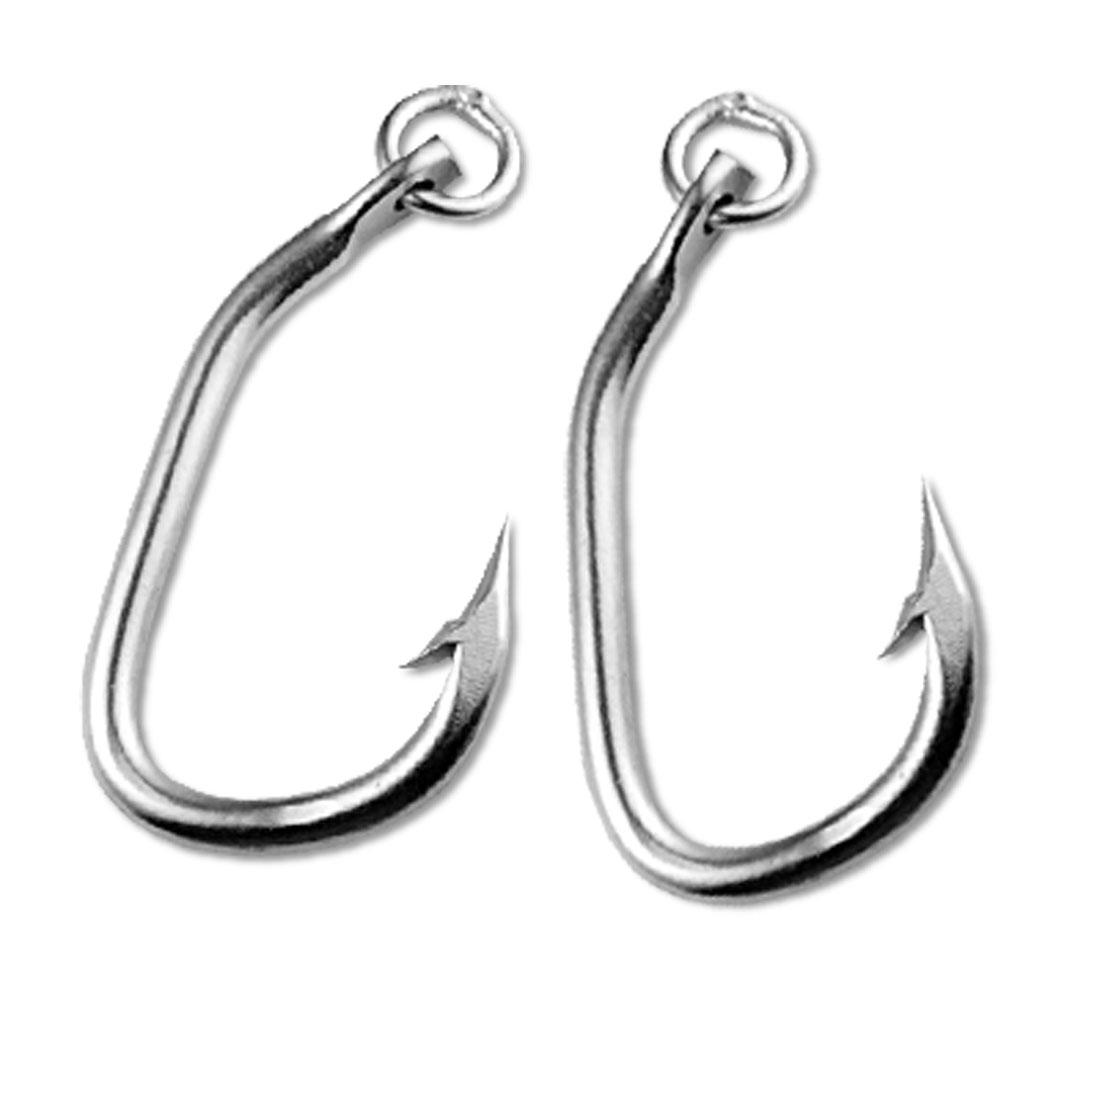 #3.6 Pair Saltwater Tuna Fishhooks Big Game Trolling Fishing Hooks